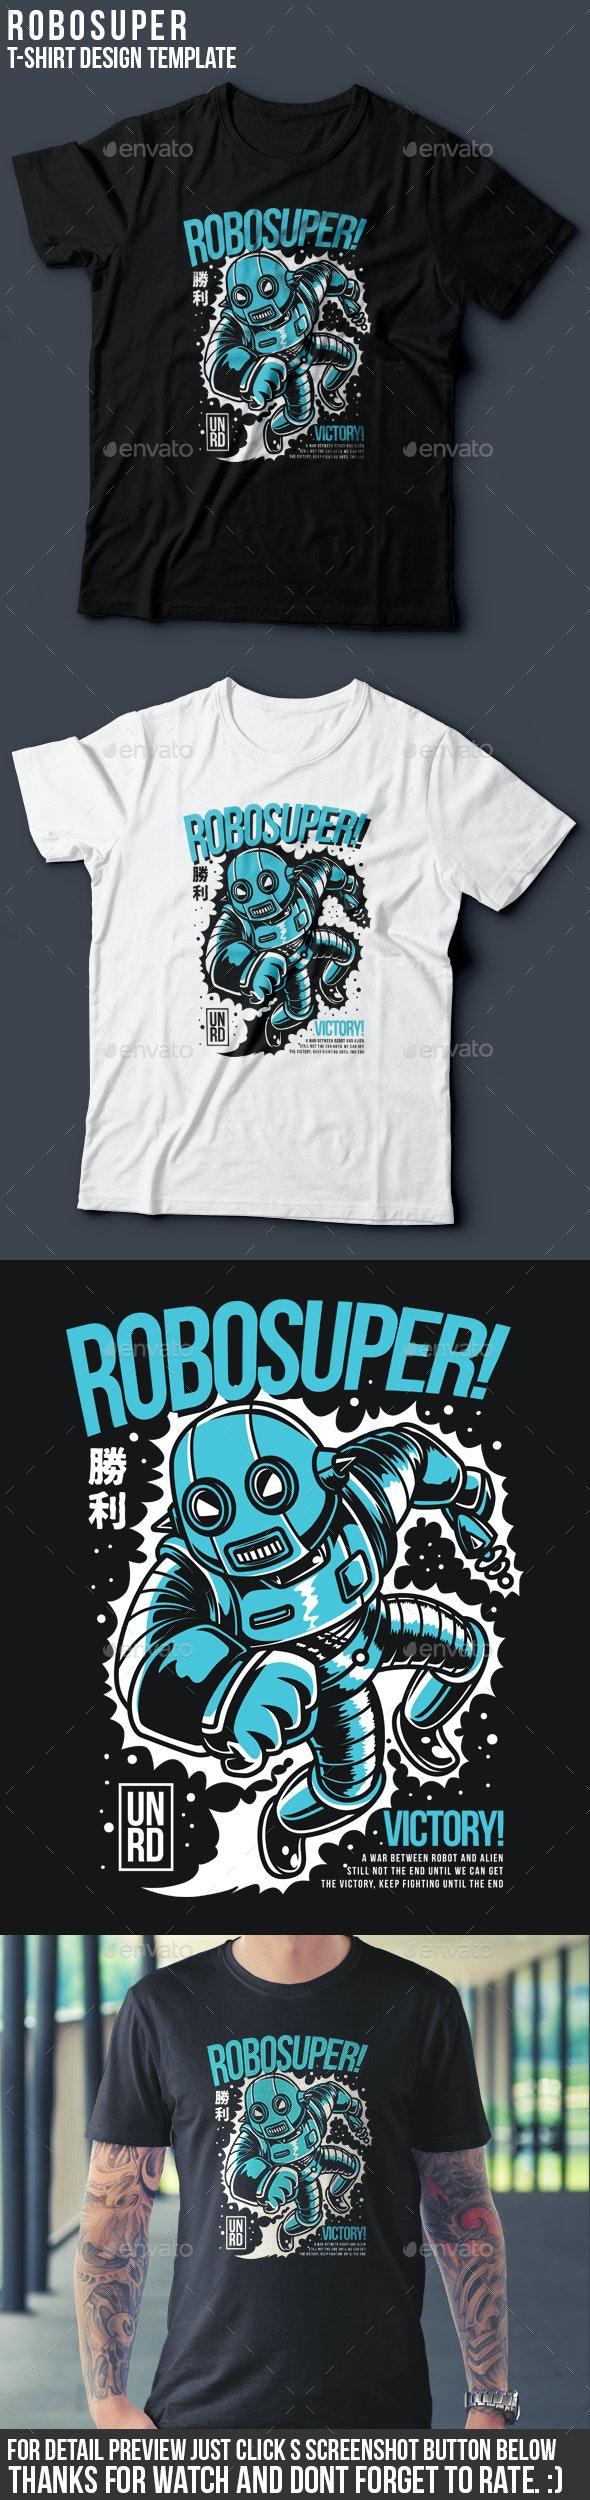 Robosuper T-Shirt Design - Funny Designs